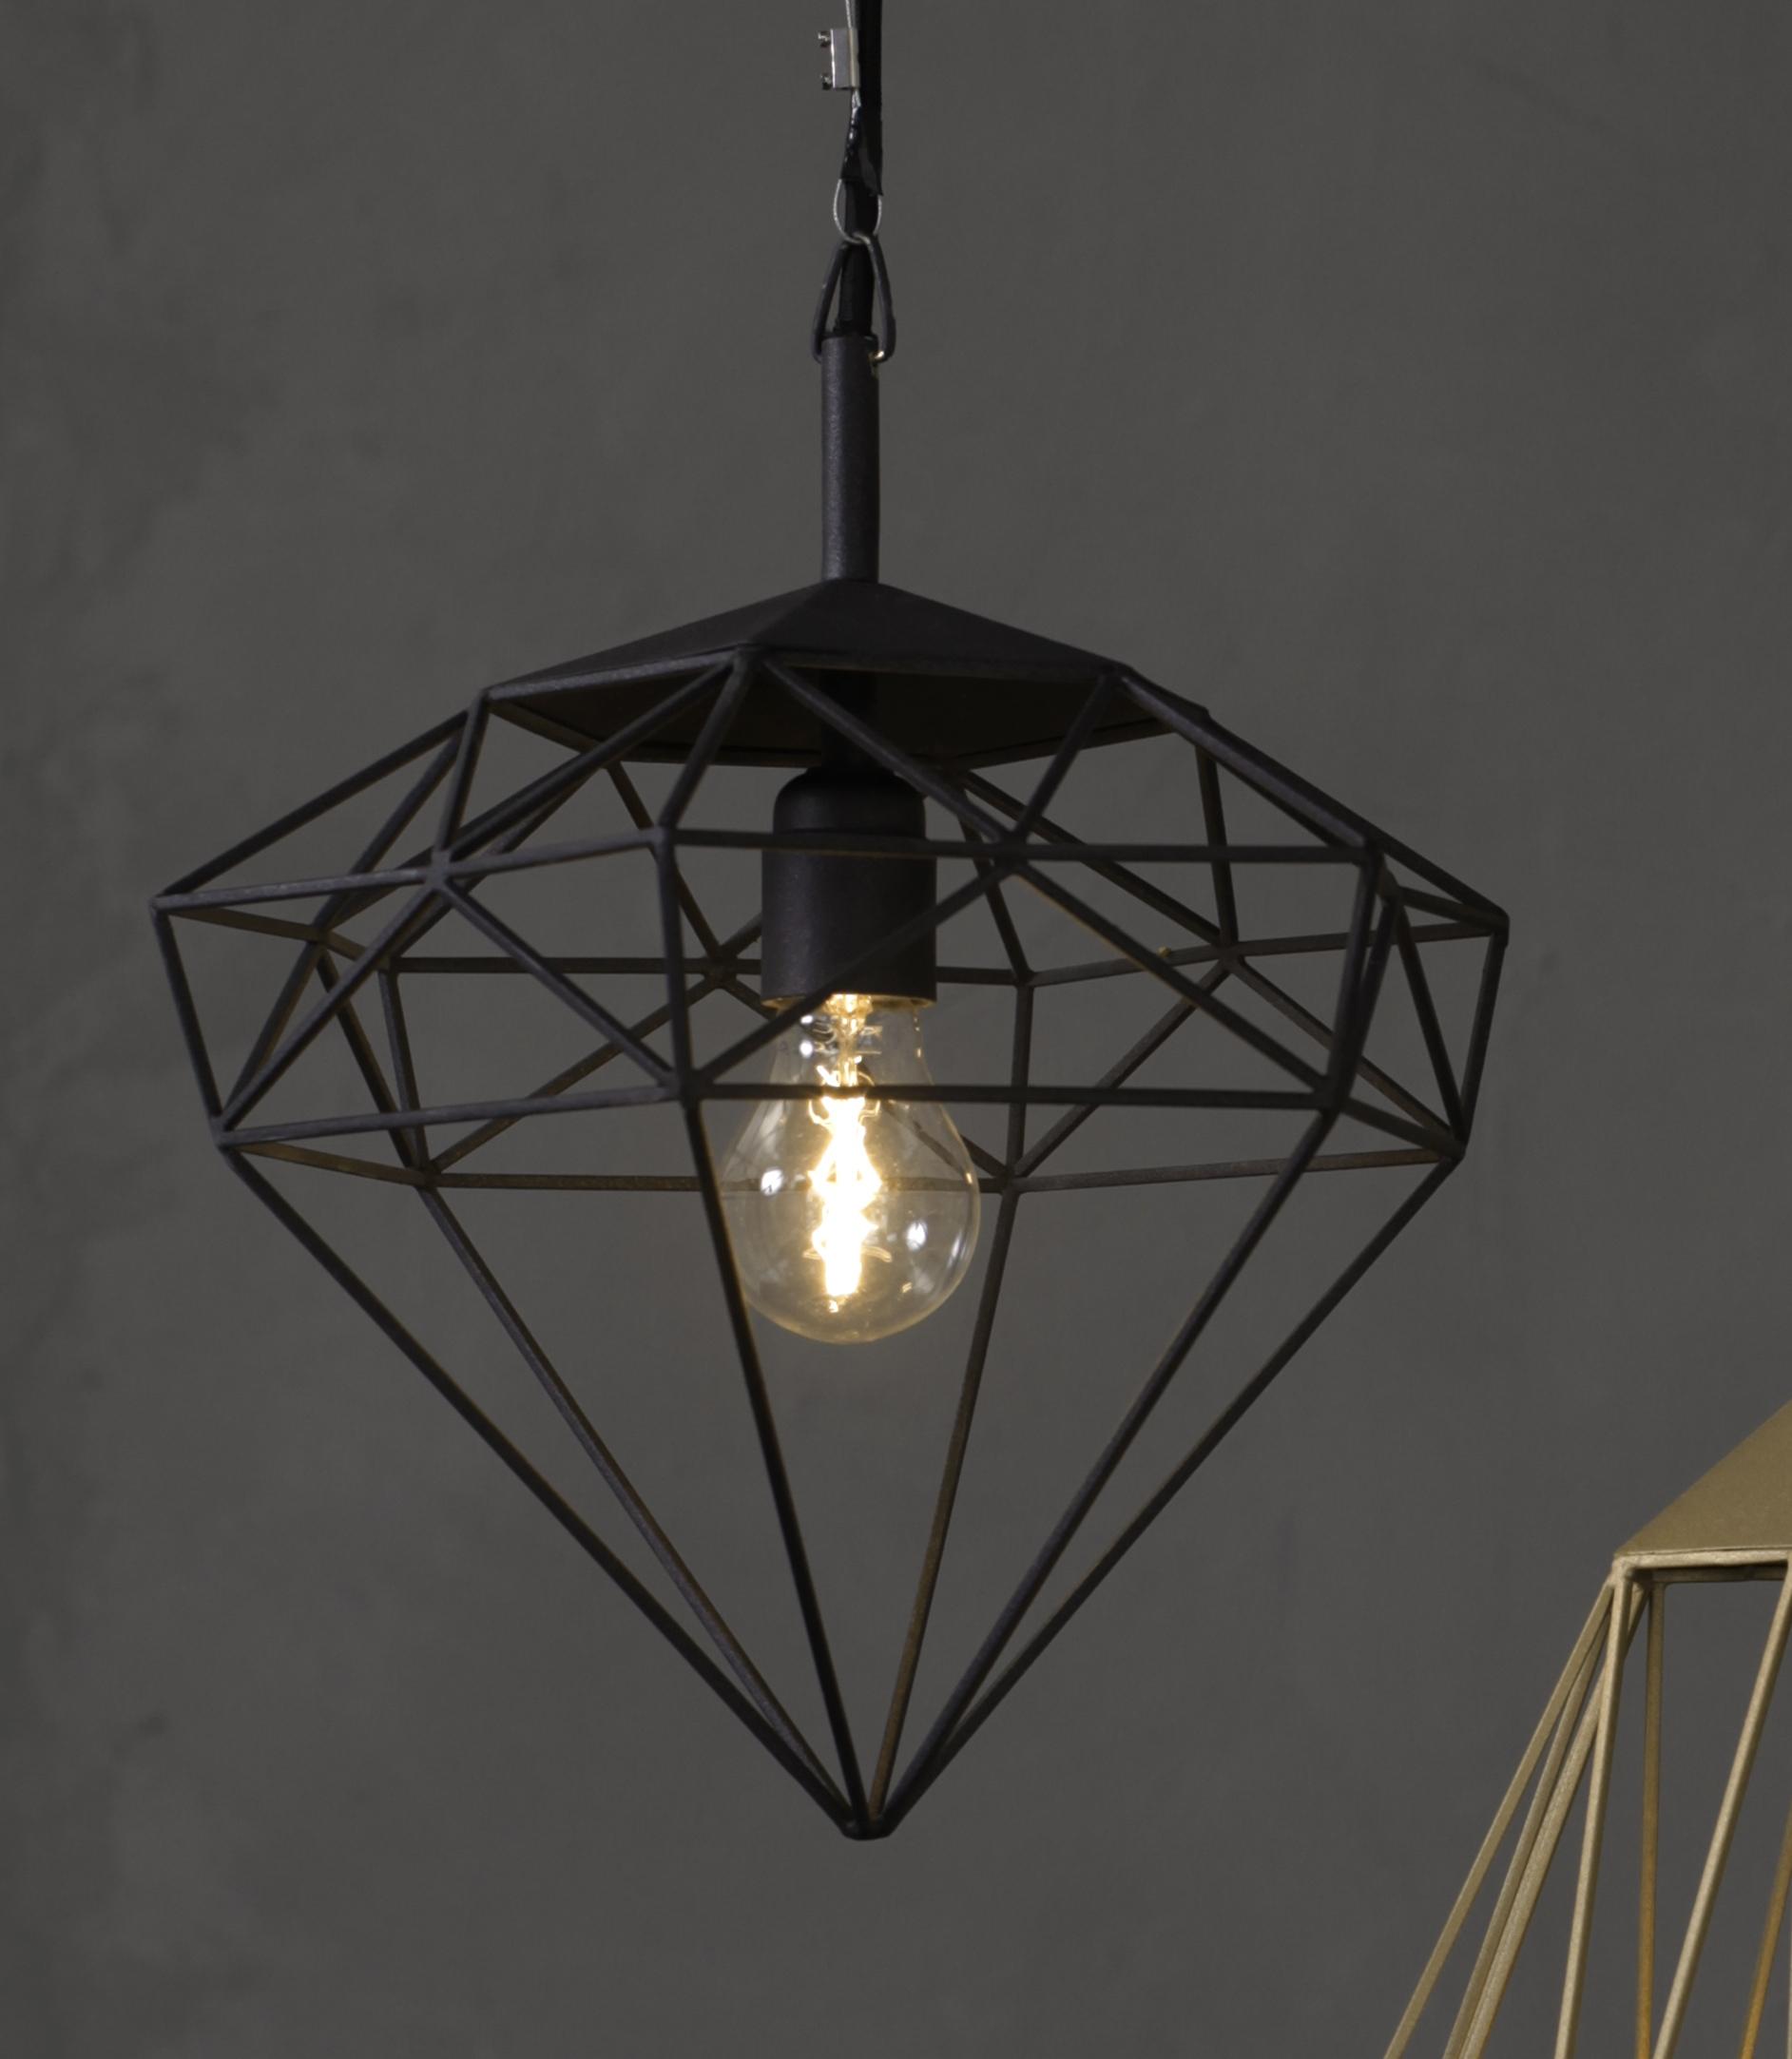 Suspension diamond small noir h34cm jspr luminaires for Luminaire suspension noir